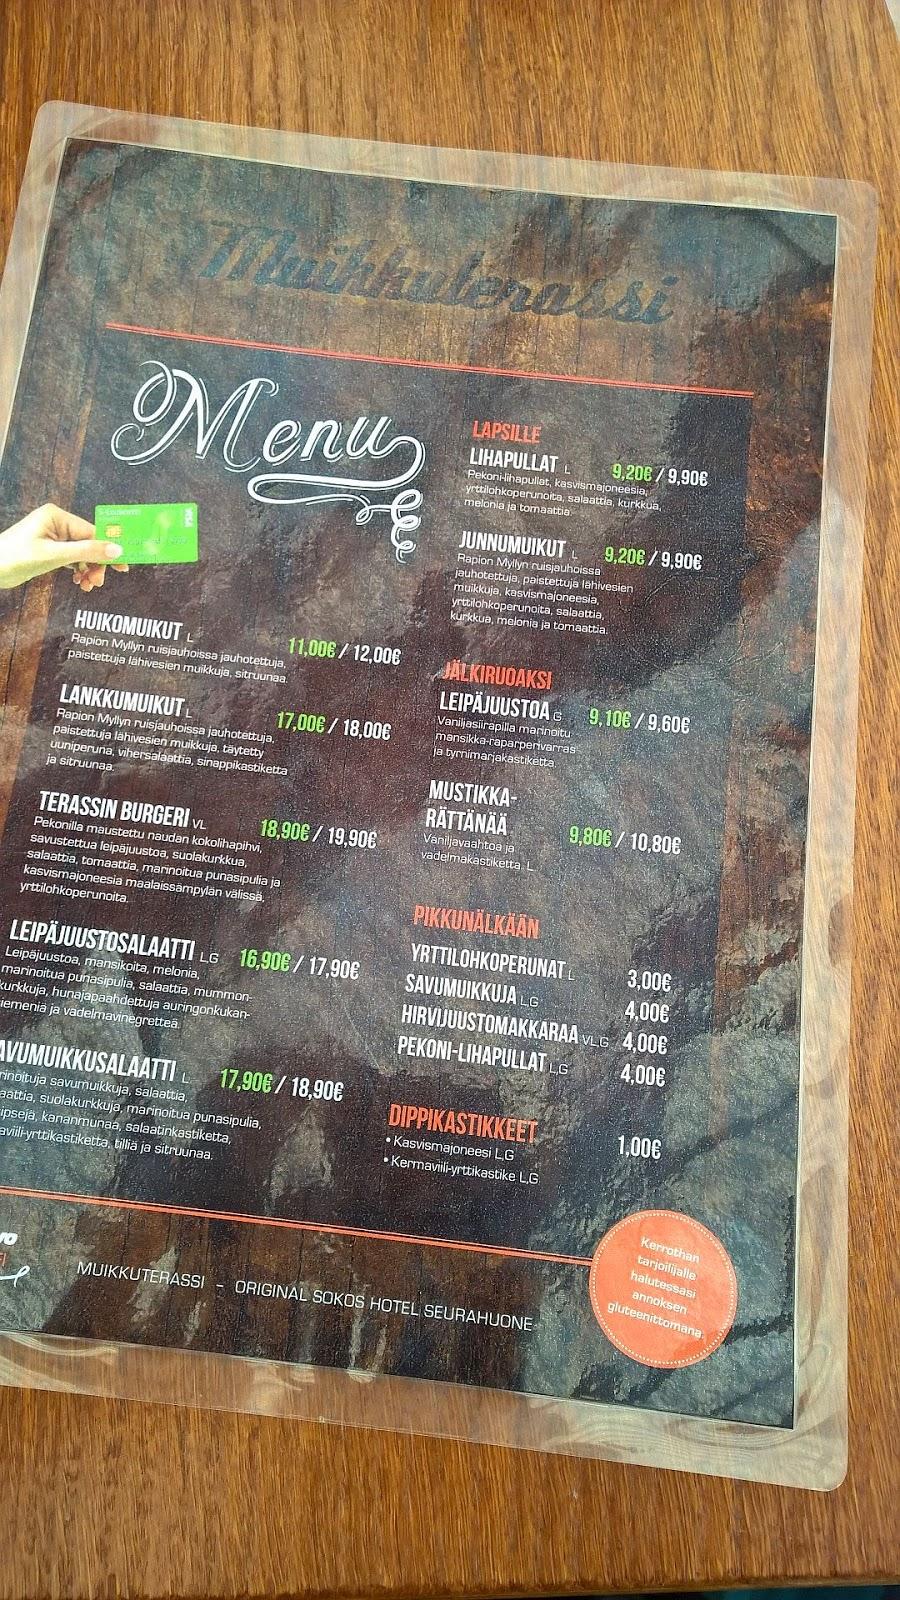 savonlinna muikkuterassi menu seurahuone